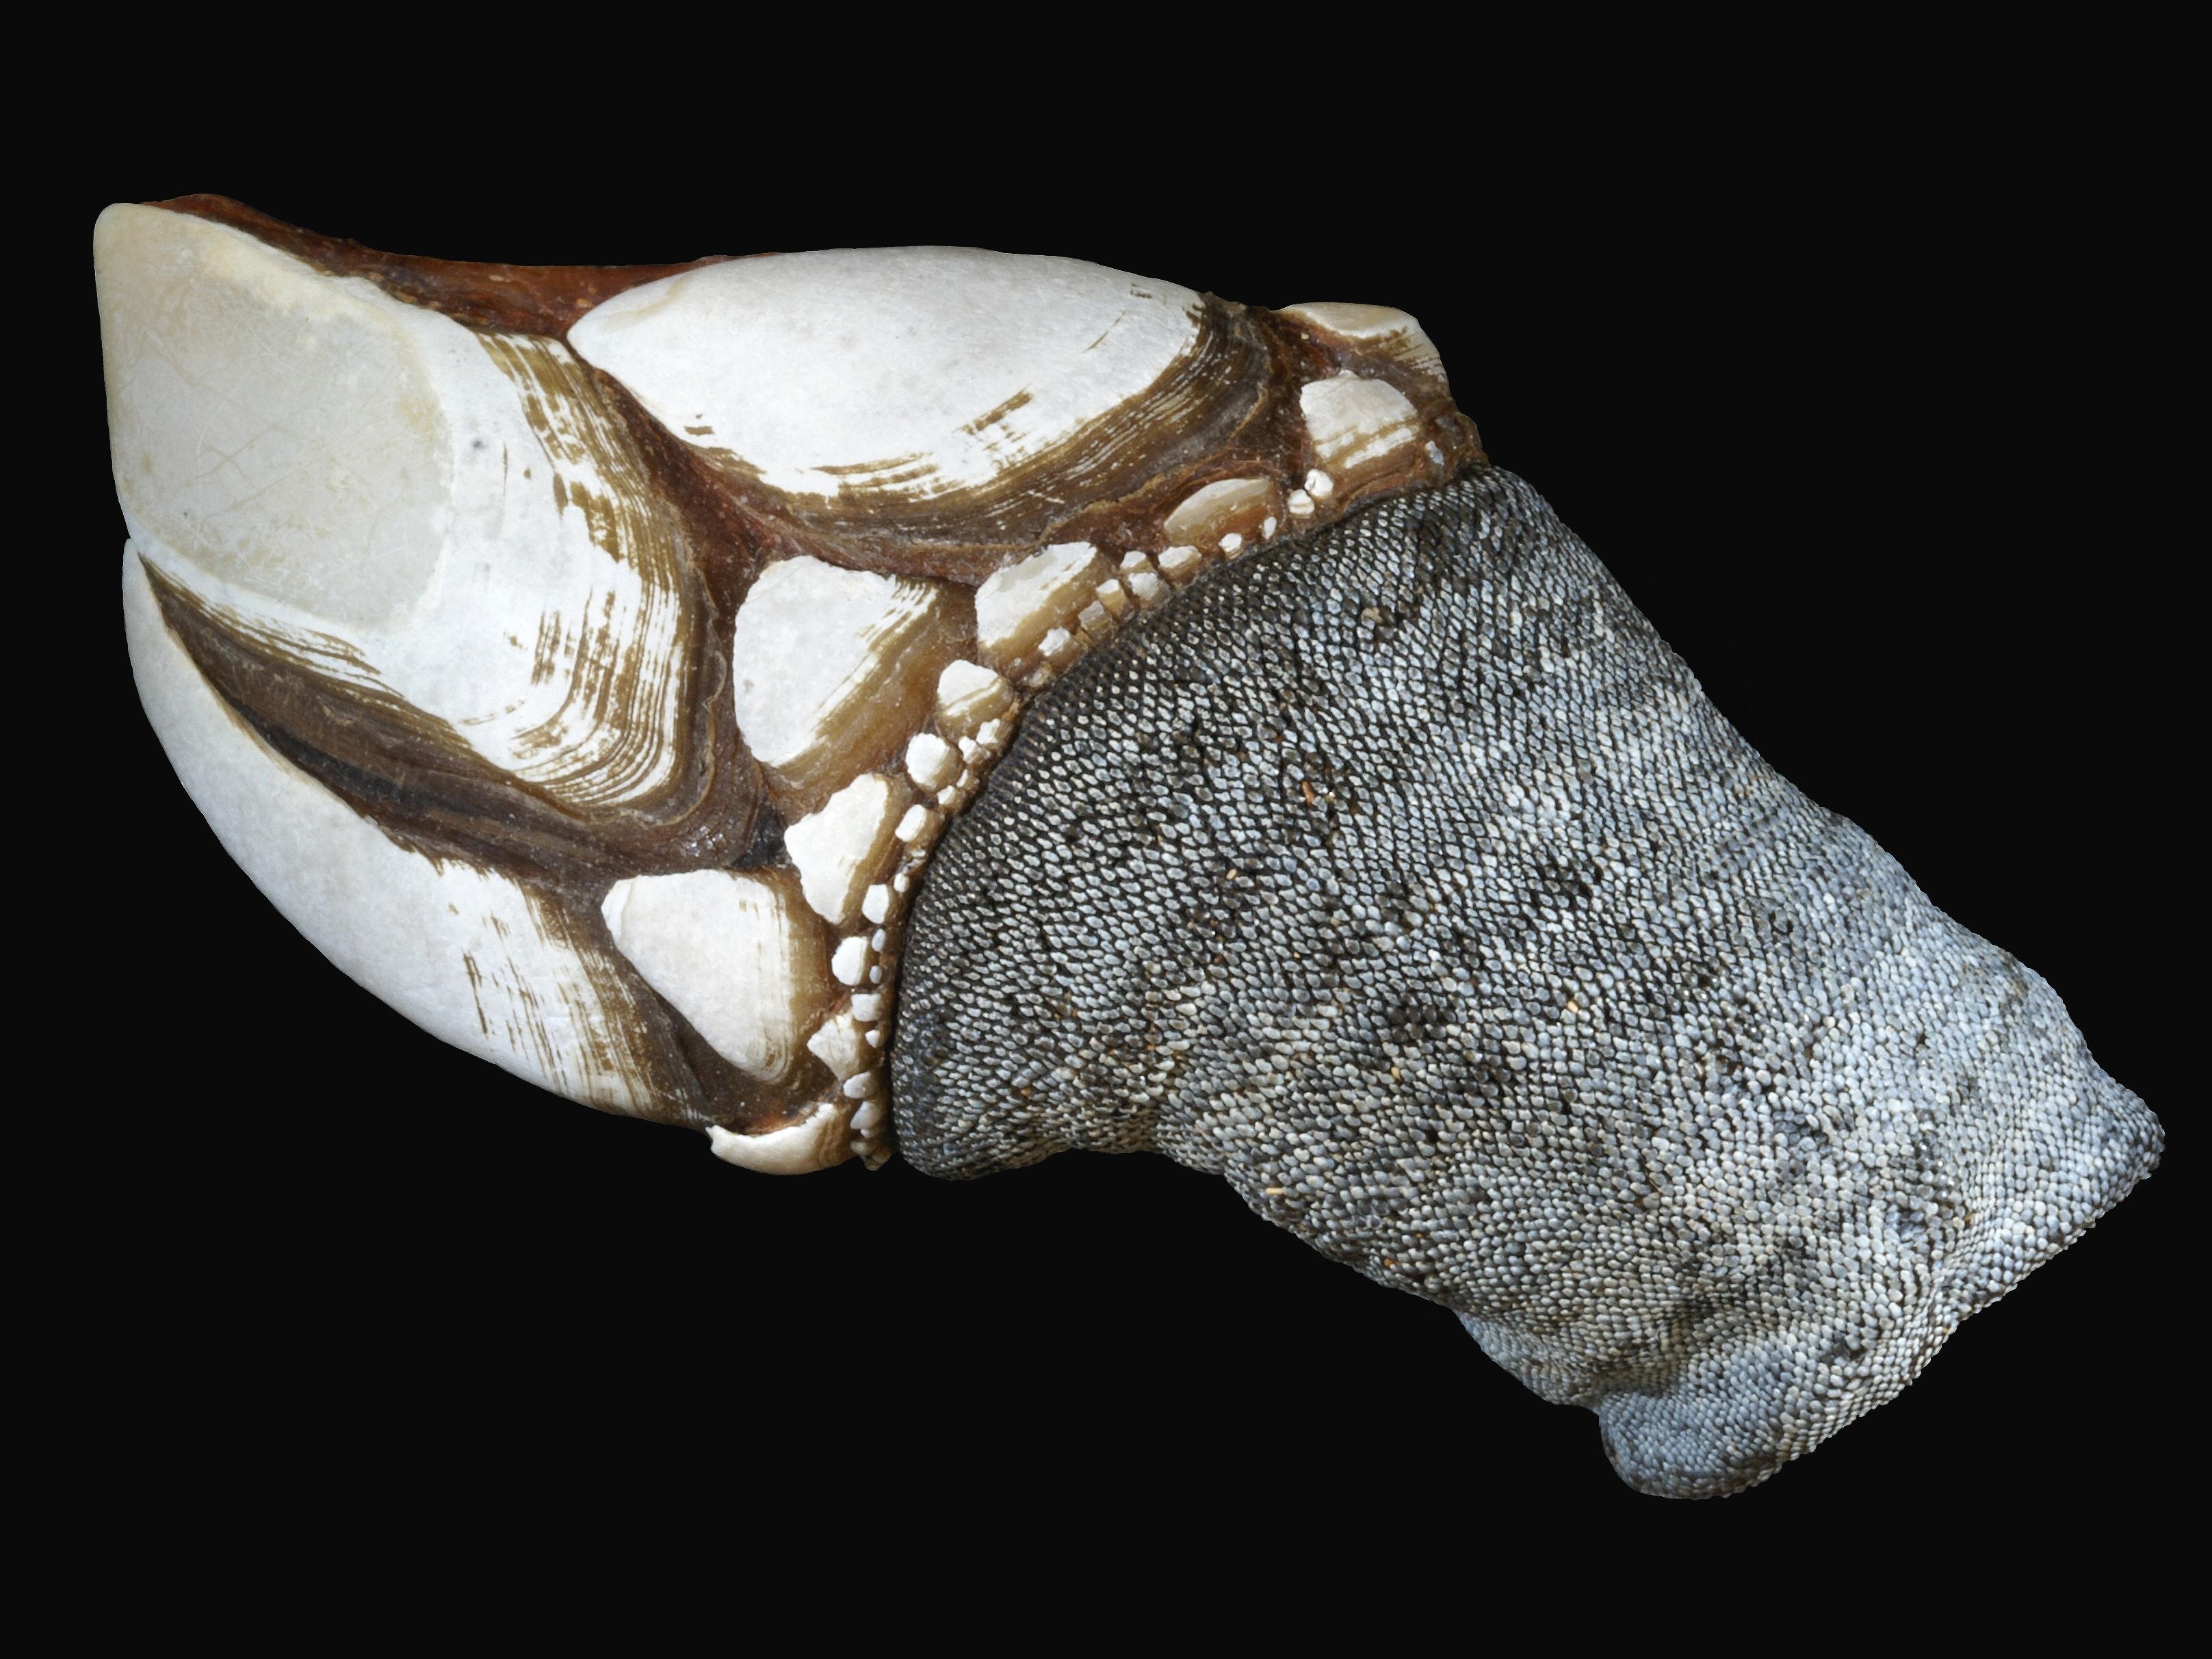 Pollicipes cornucopia